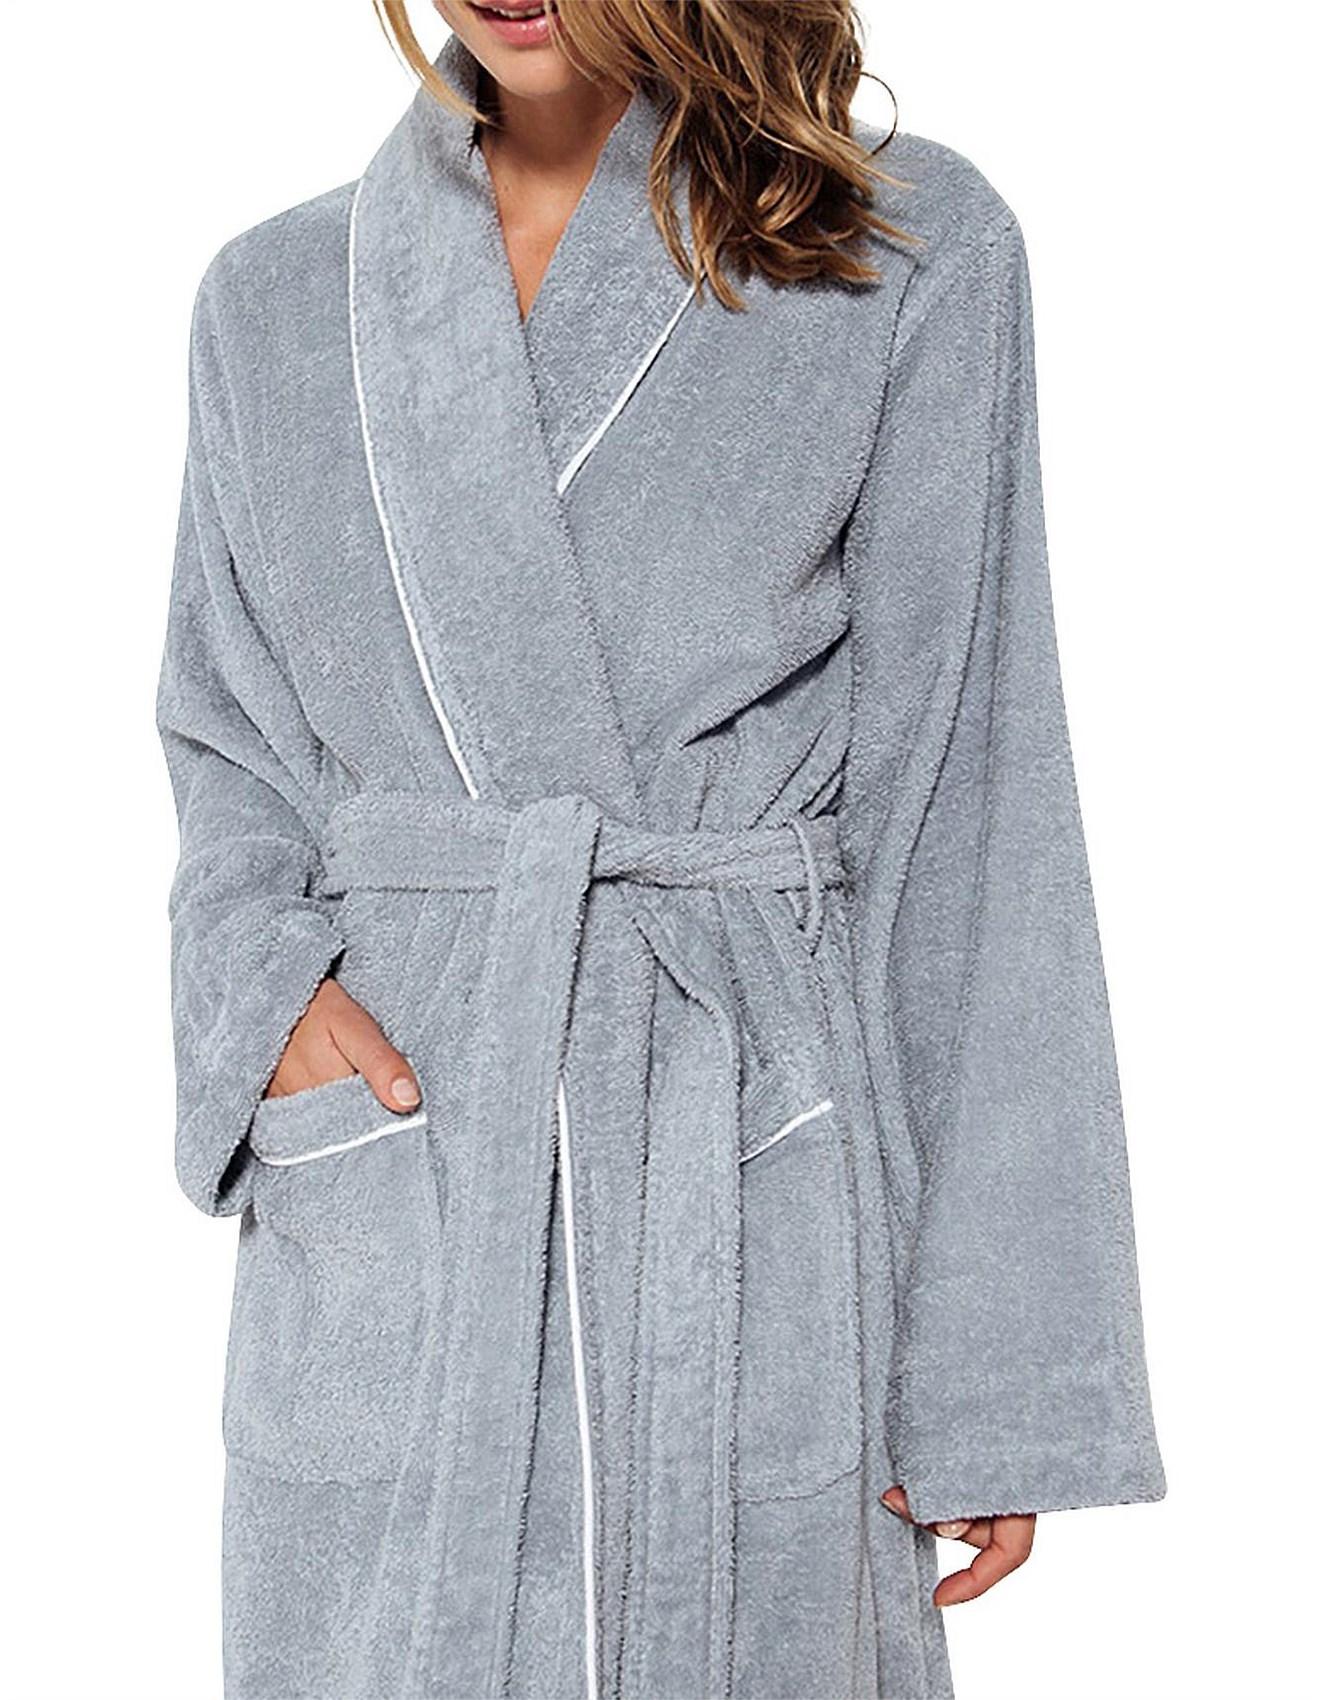 bbaa9ae7fc Elissa Lux Egyptian Spa Robe. 1  2  3. Zoom. Sheridan